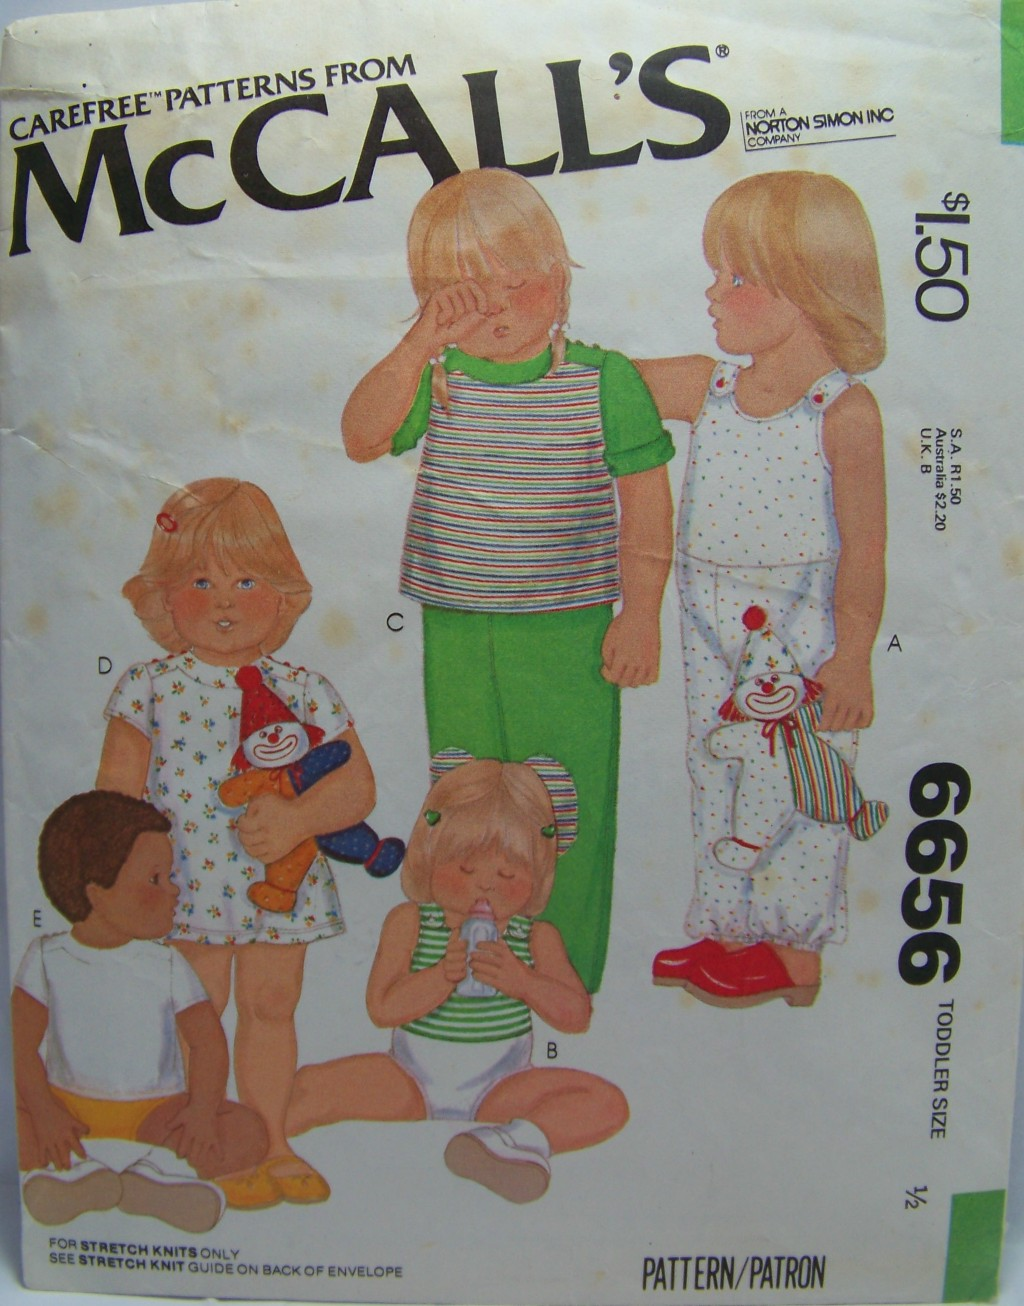 McCall's 6656 A